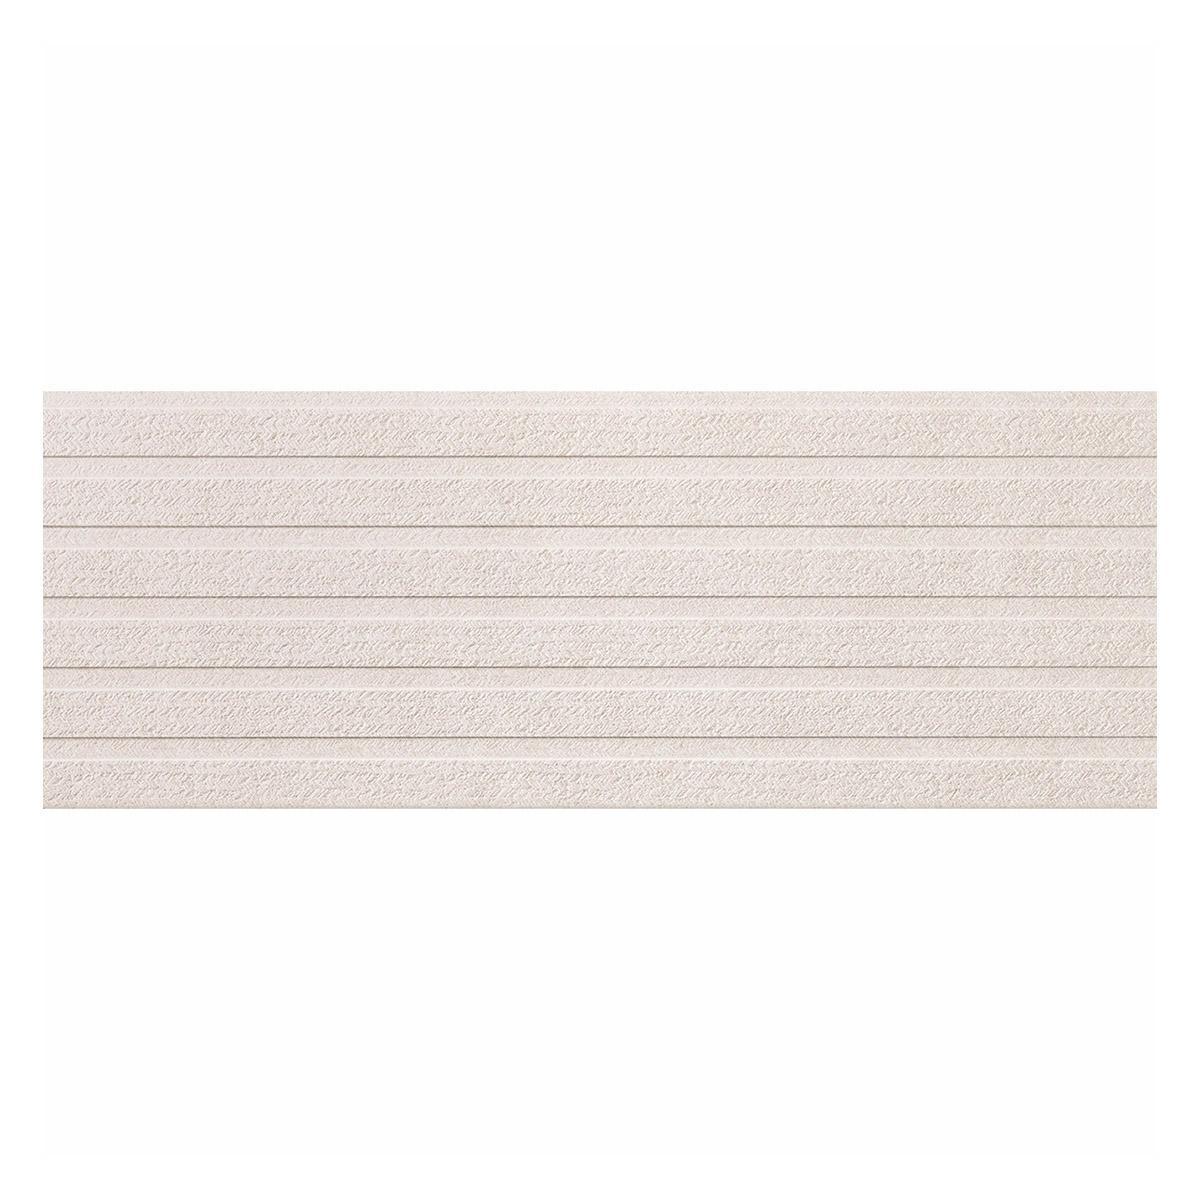 Mayólica Capri Blanco Mate - 45X120 cm - 1.62 m2